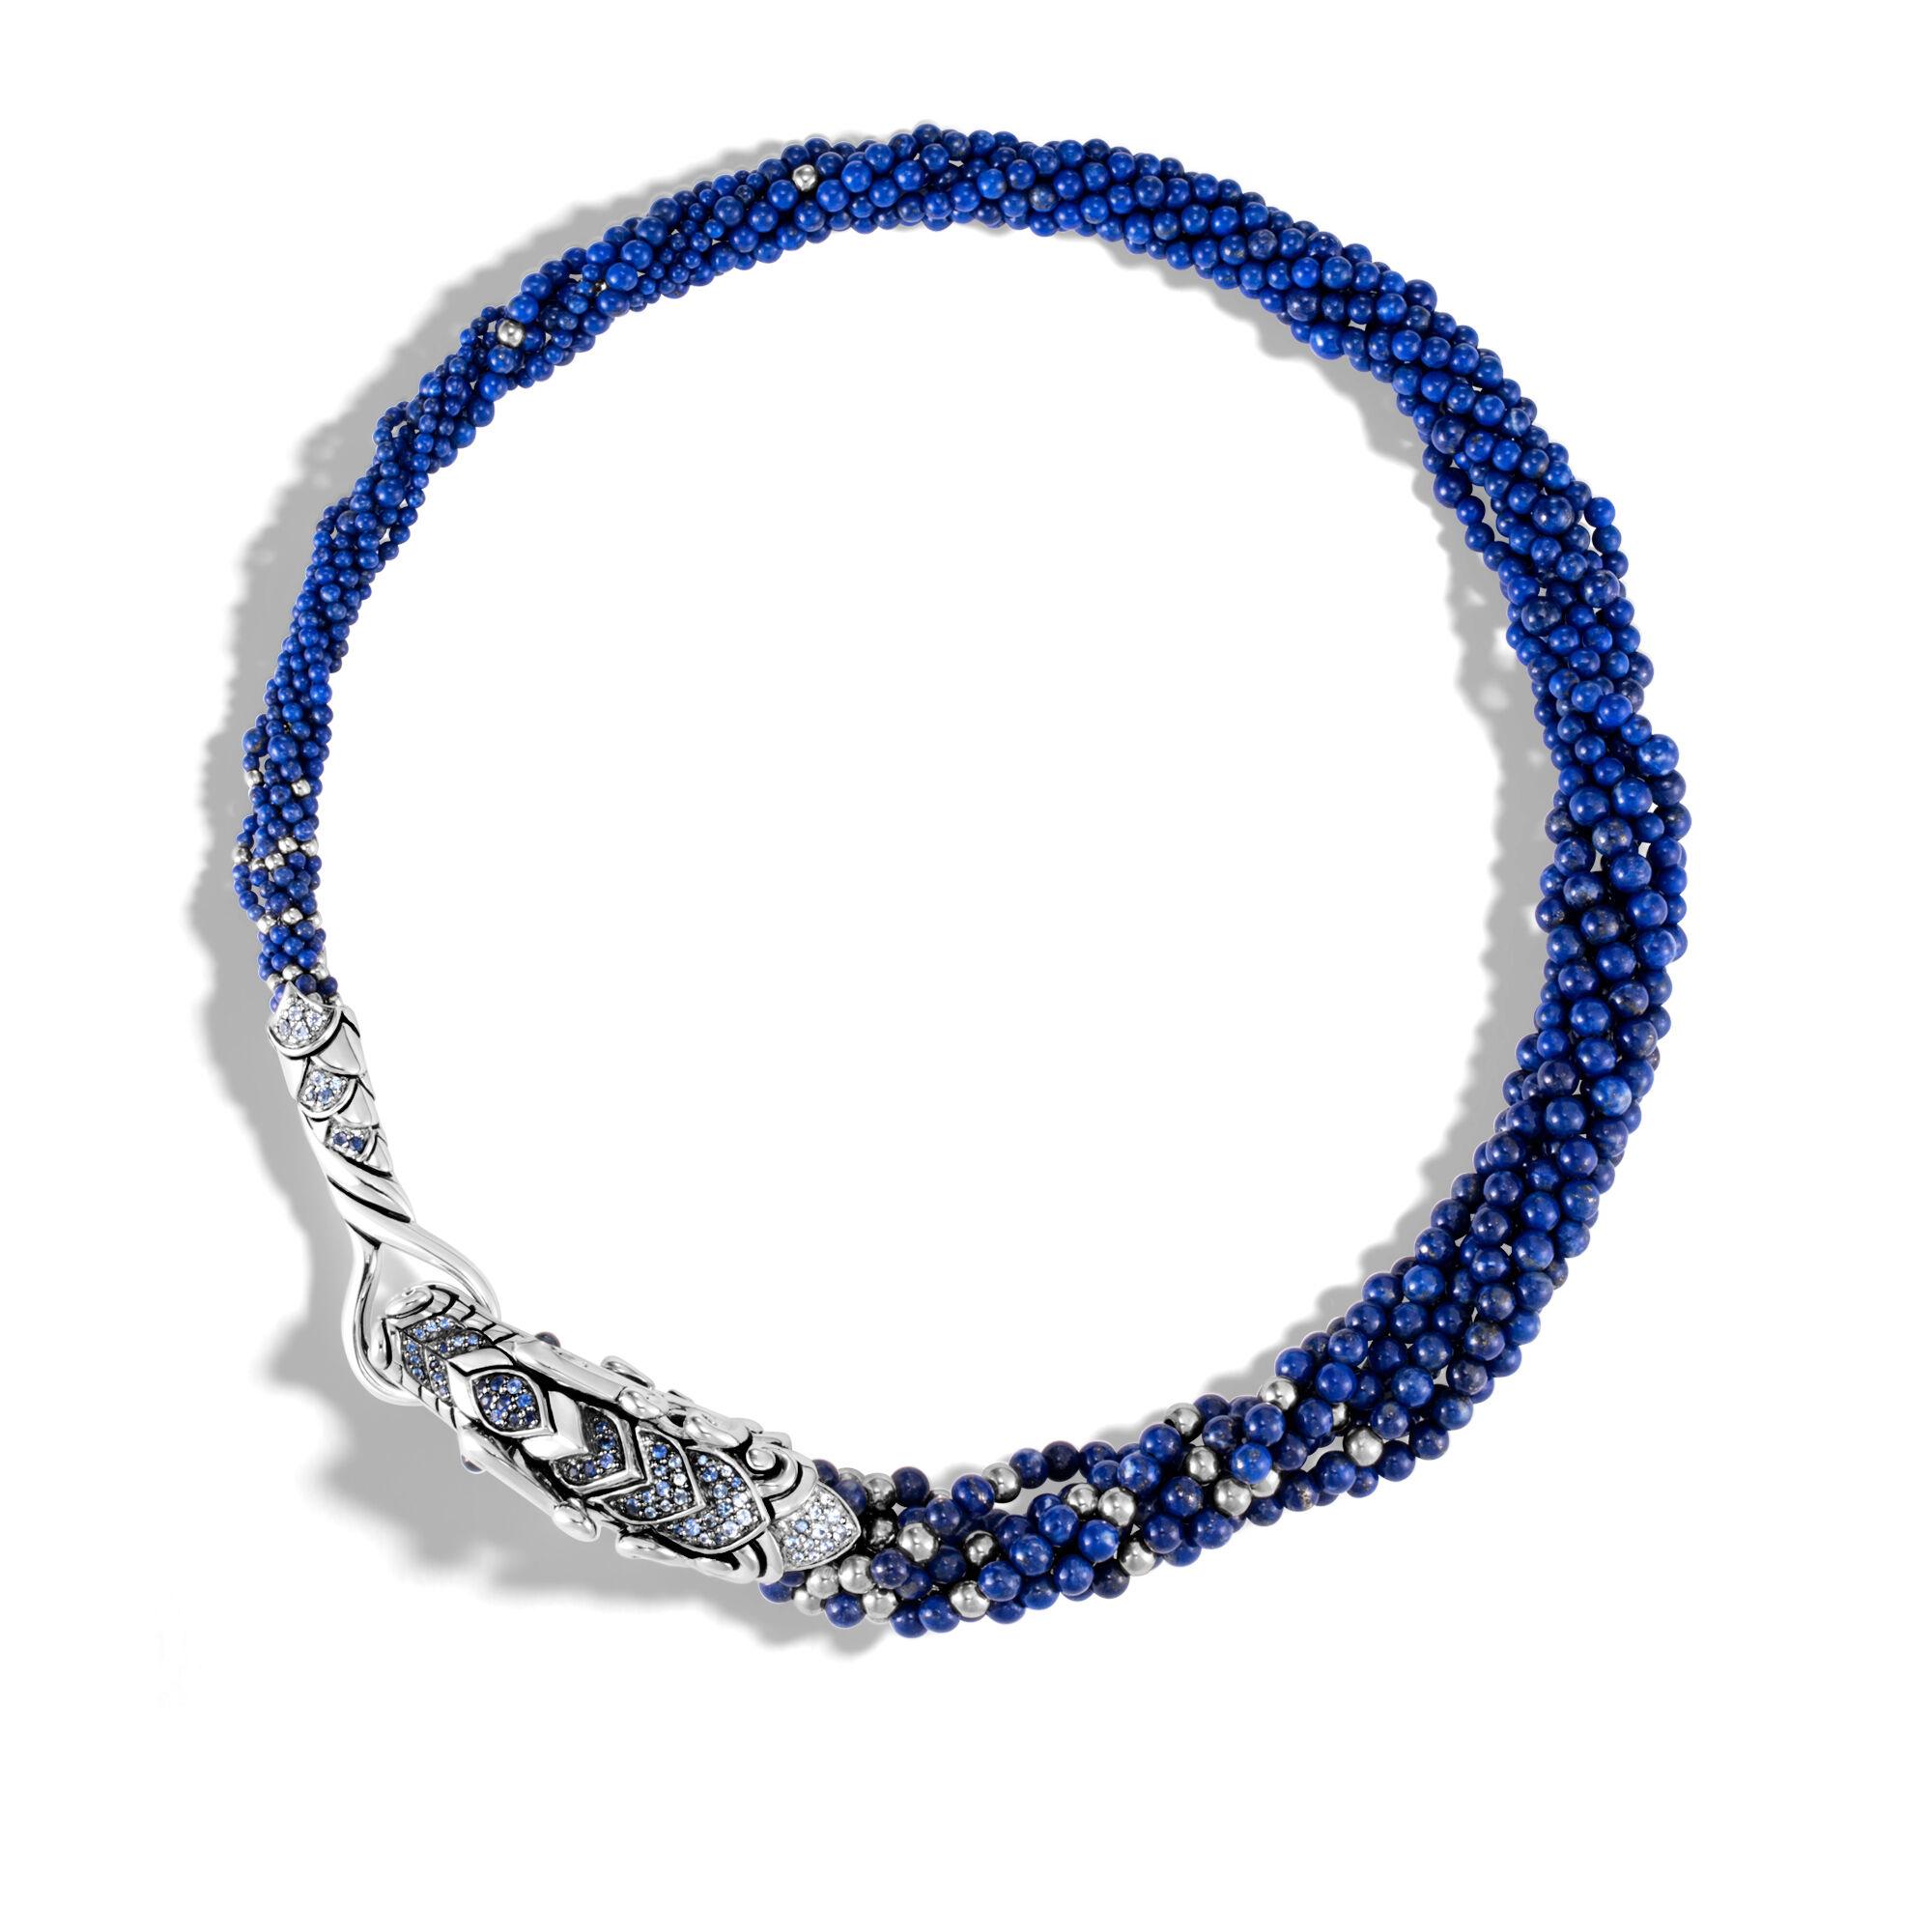 John Hardy Naga Multi Row Necklace With Lapis Lazuli, Blue Sapphire